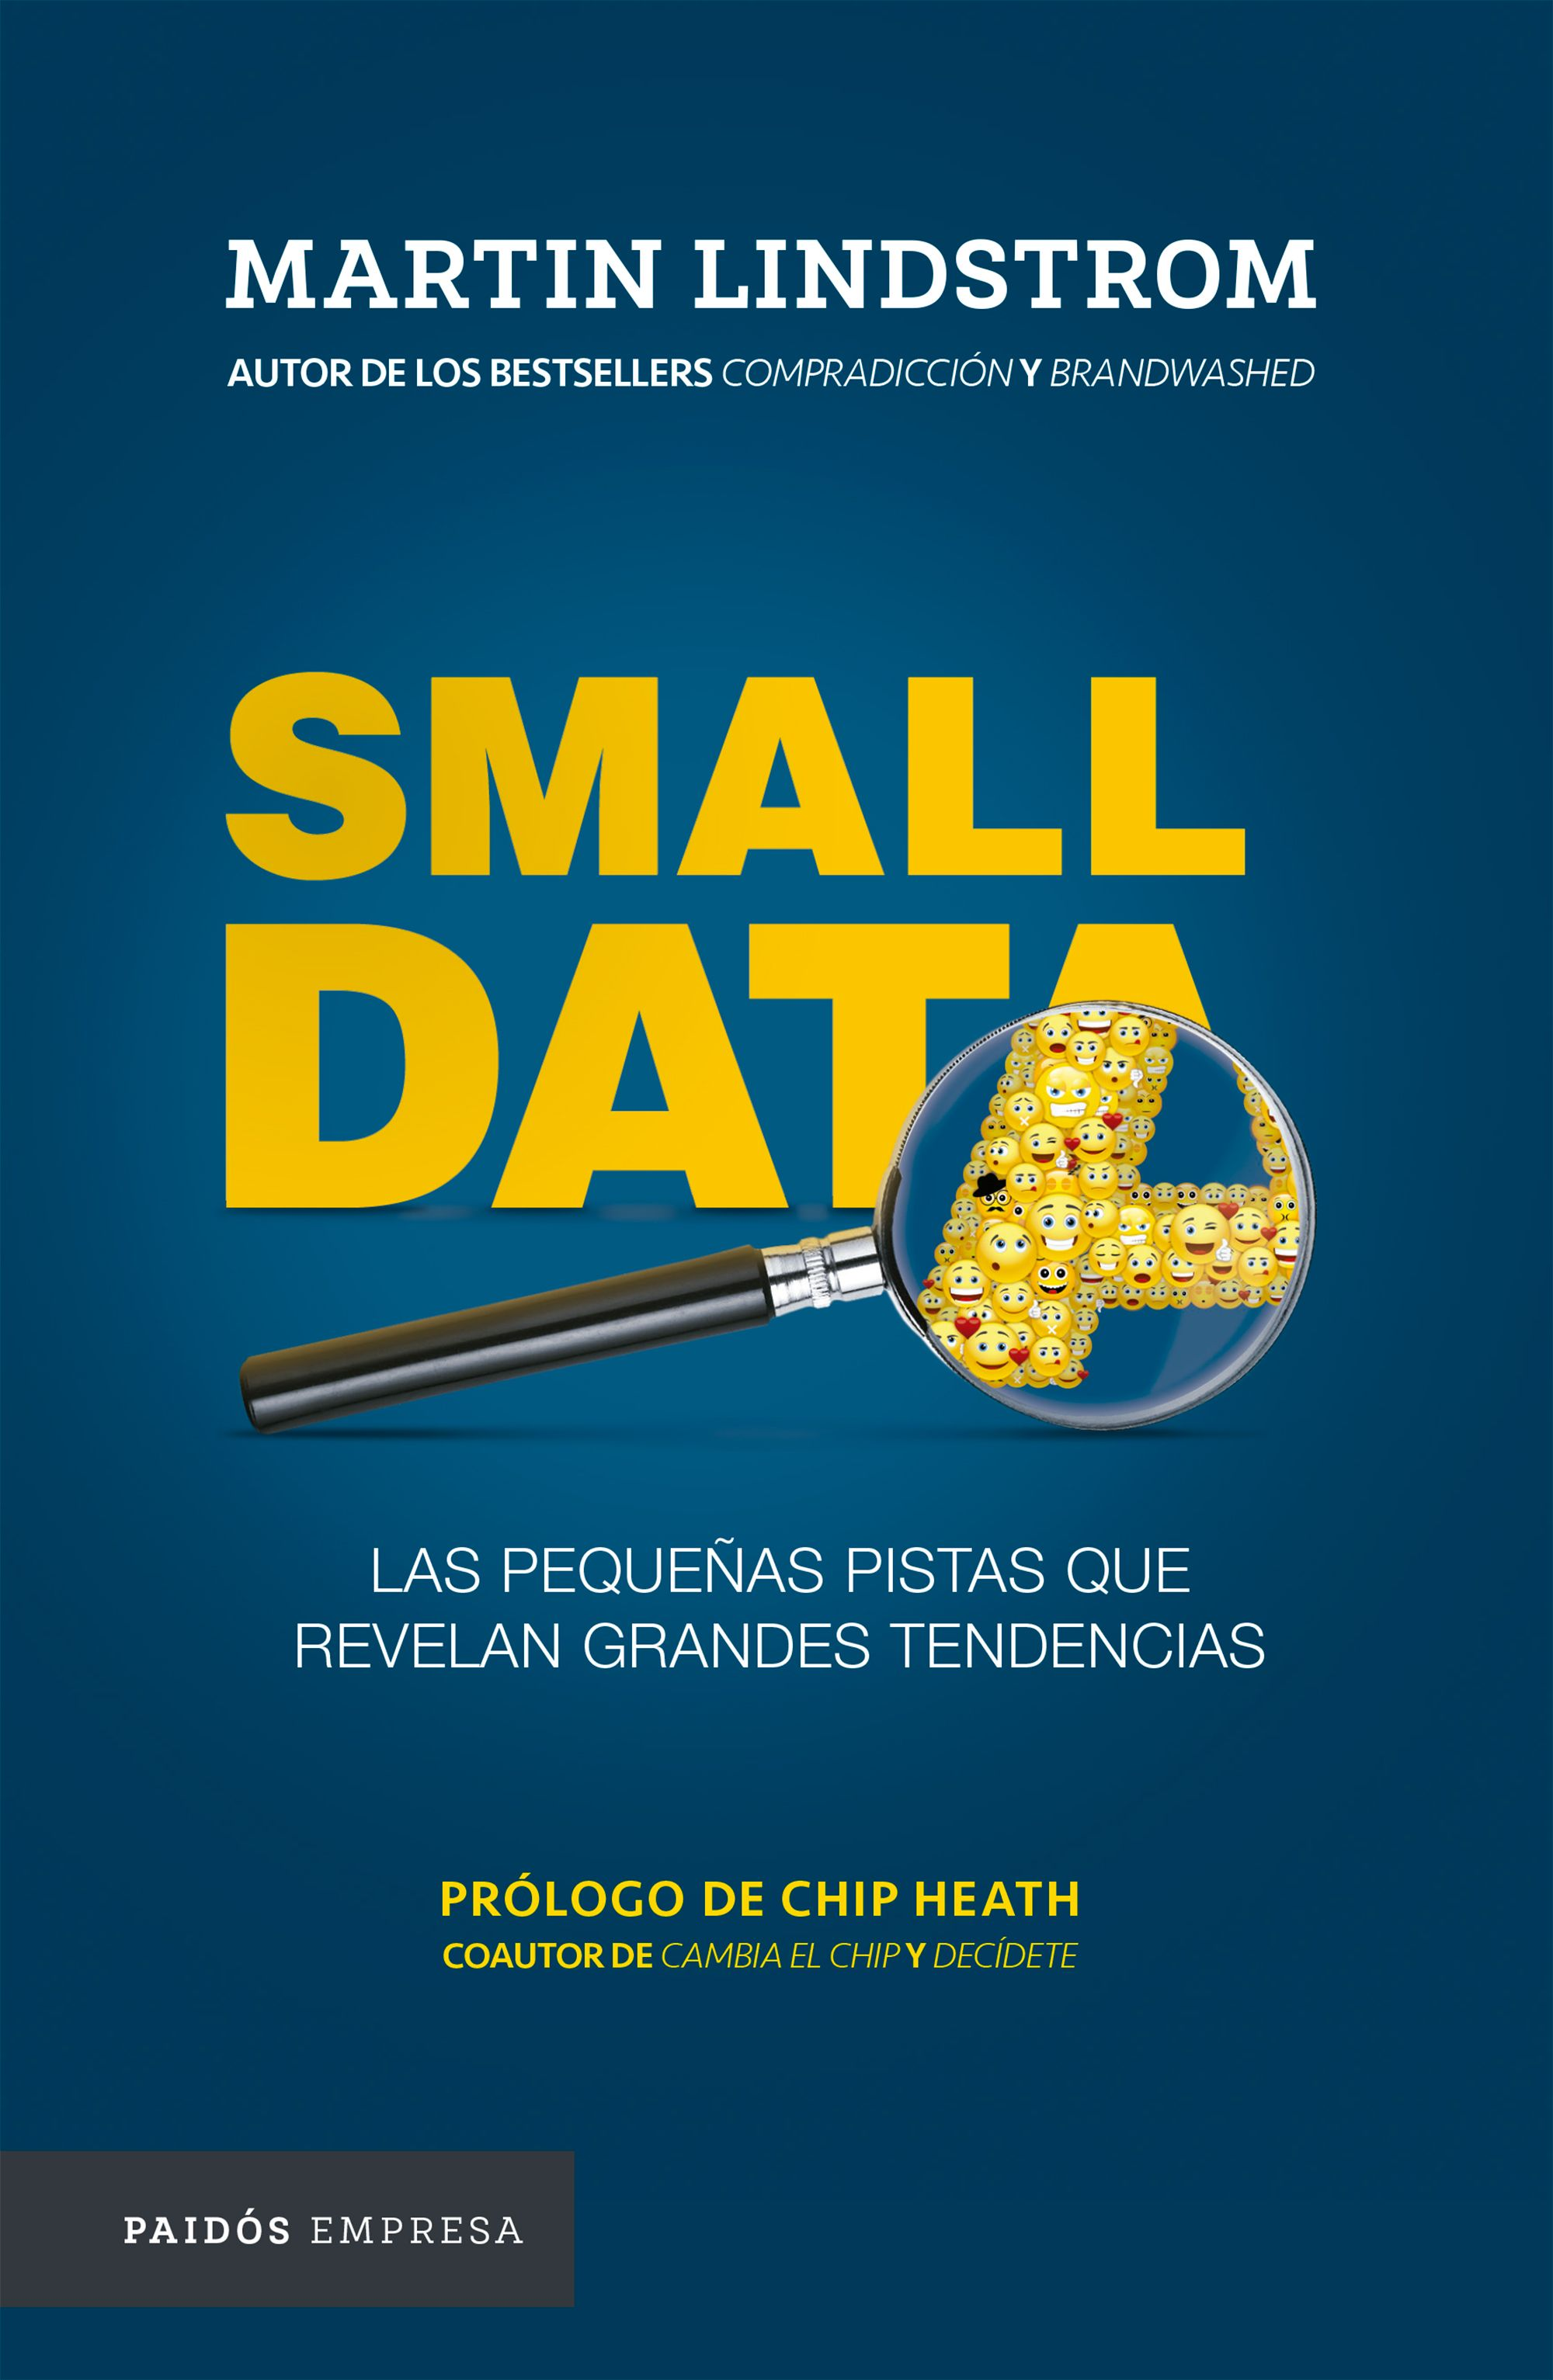 Small Data. Las Pequeñas Pistas que Revelan Grandes Tendencias - Martin Lindstrom - Paidos